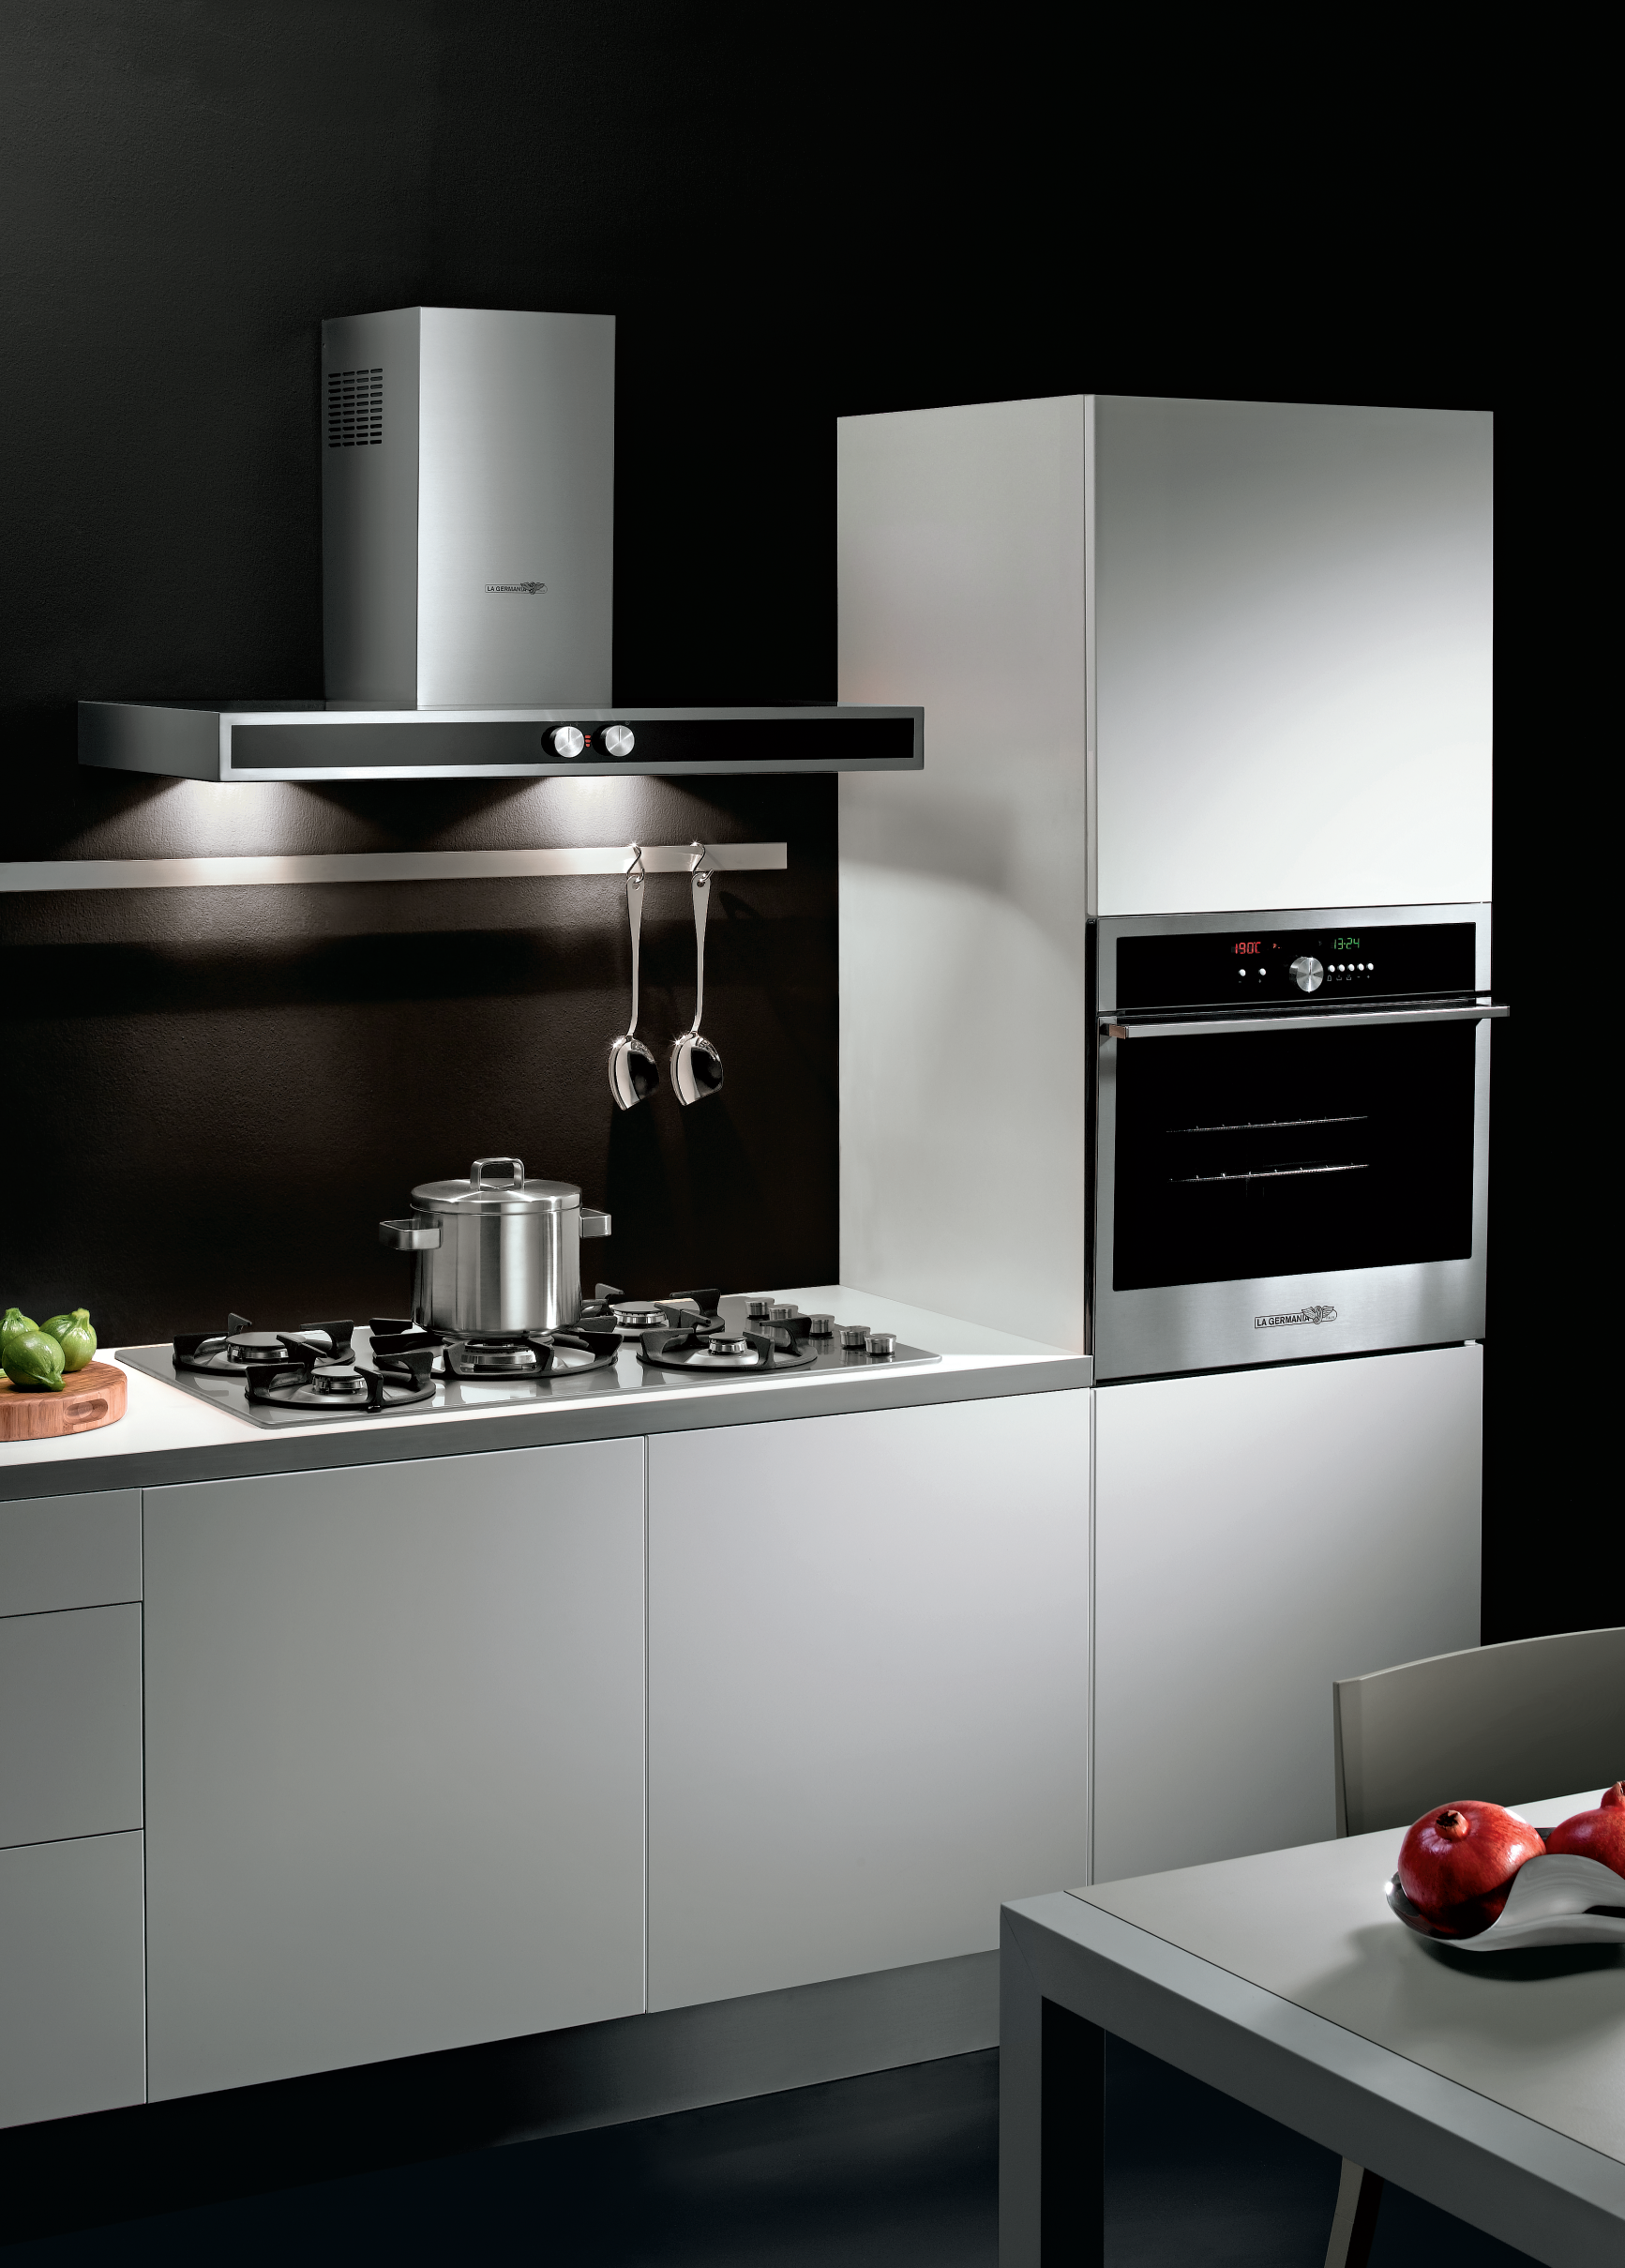 Iconic Appliances La Germania By Hafele Kitchen Design Luxury Furniture Design Furniture Design Wooden